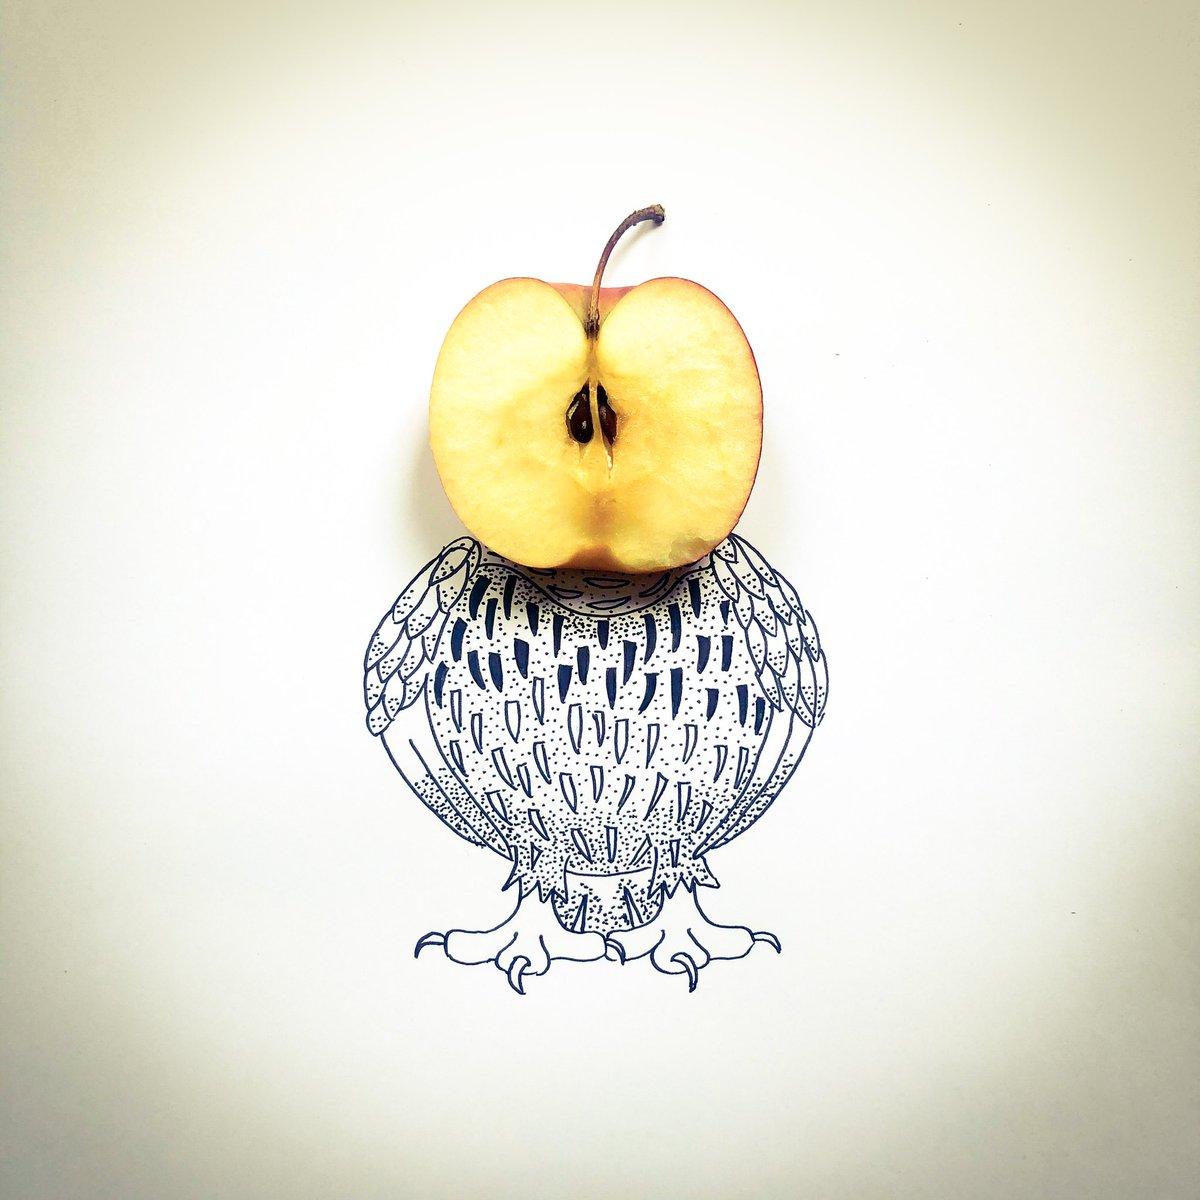 #adelefaitdesonmieux  La chouette  #pomme #pepin #joke #sketch #restezchezvous #stayathome